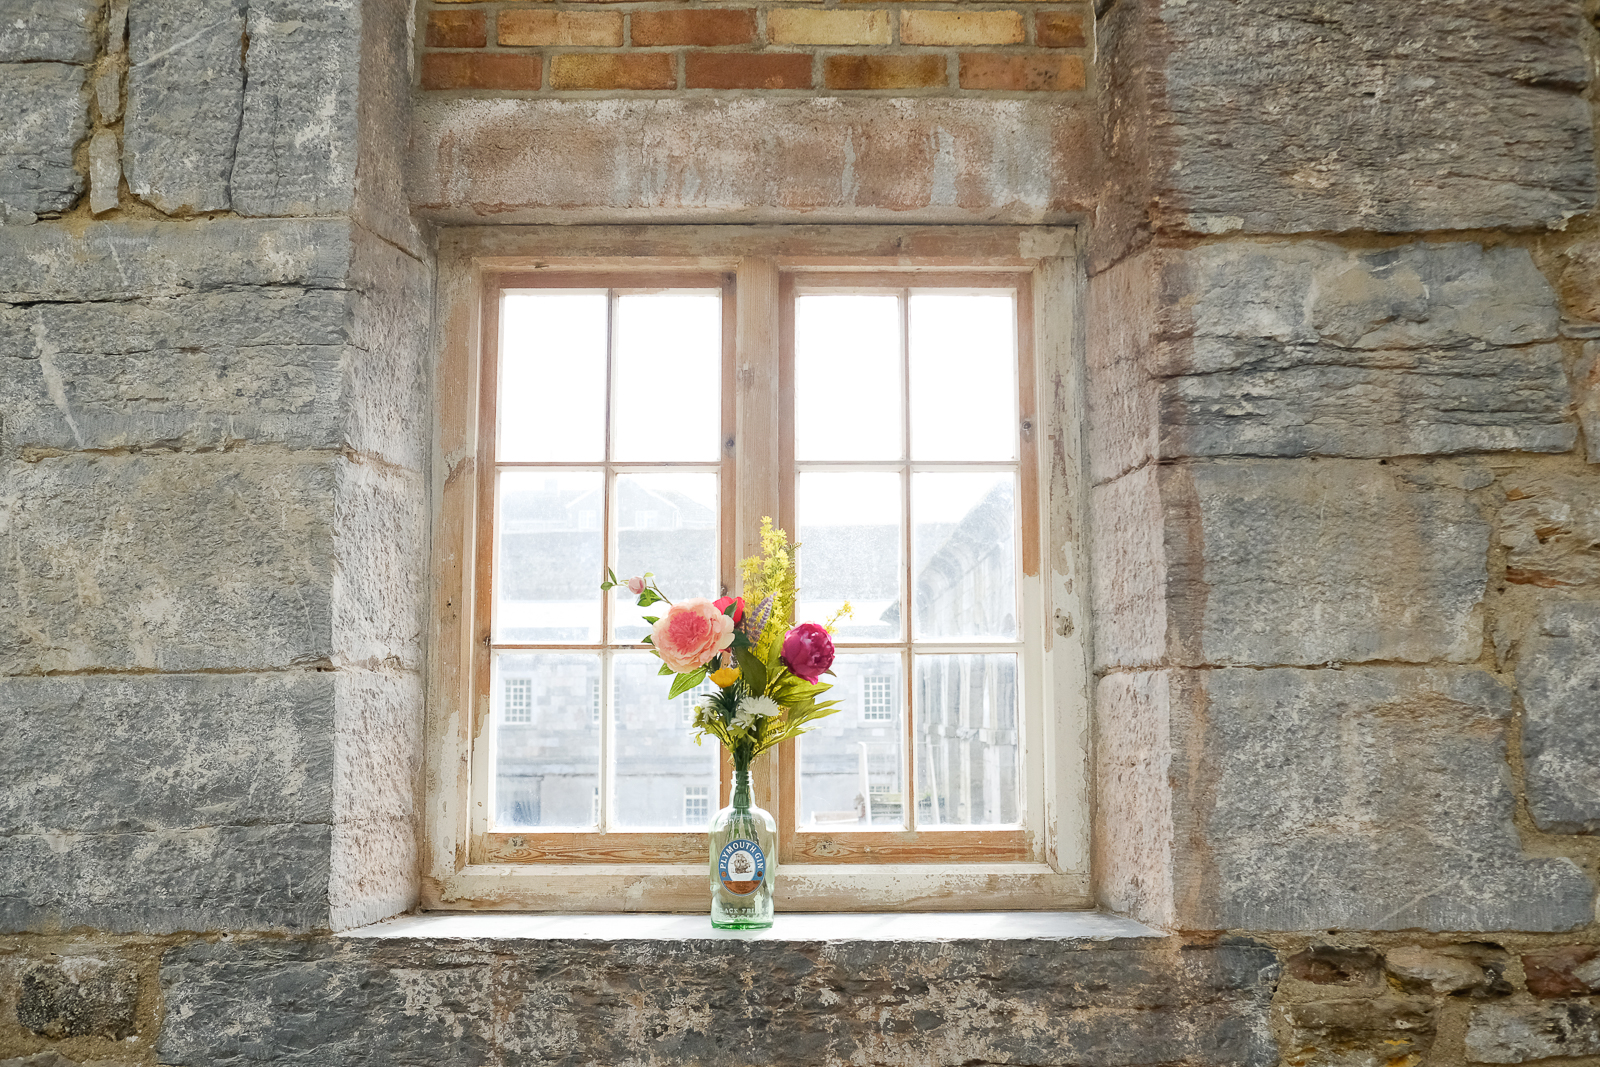 Ocean Studios at Royal William Yard and The orangery at Mount Edgcumbe wedding 022.jpg